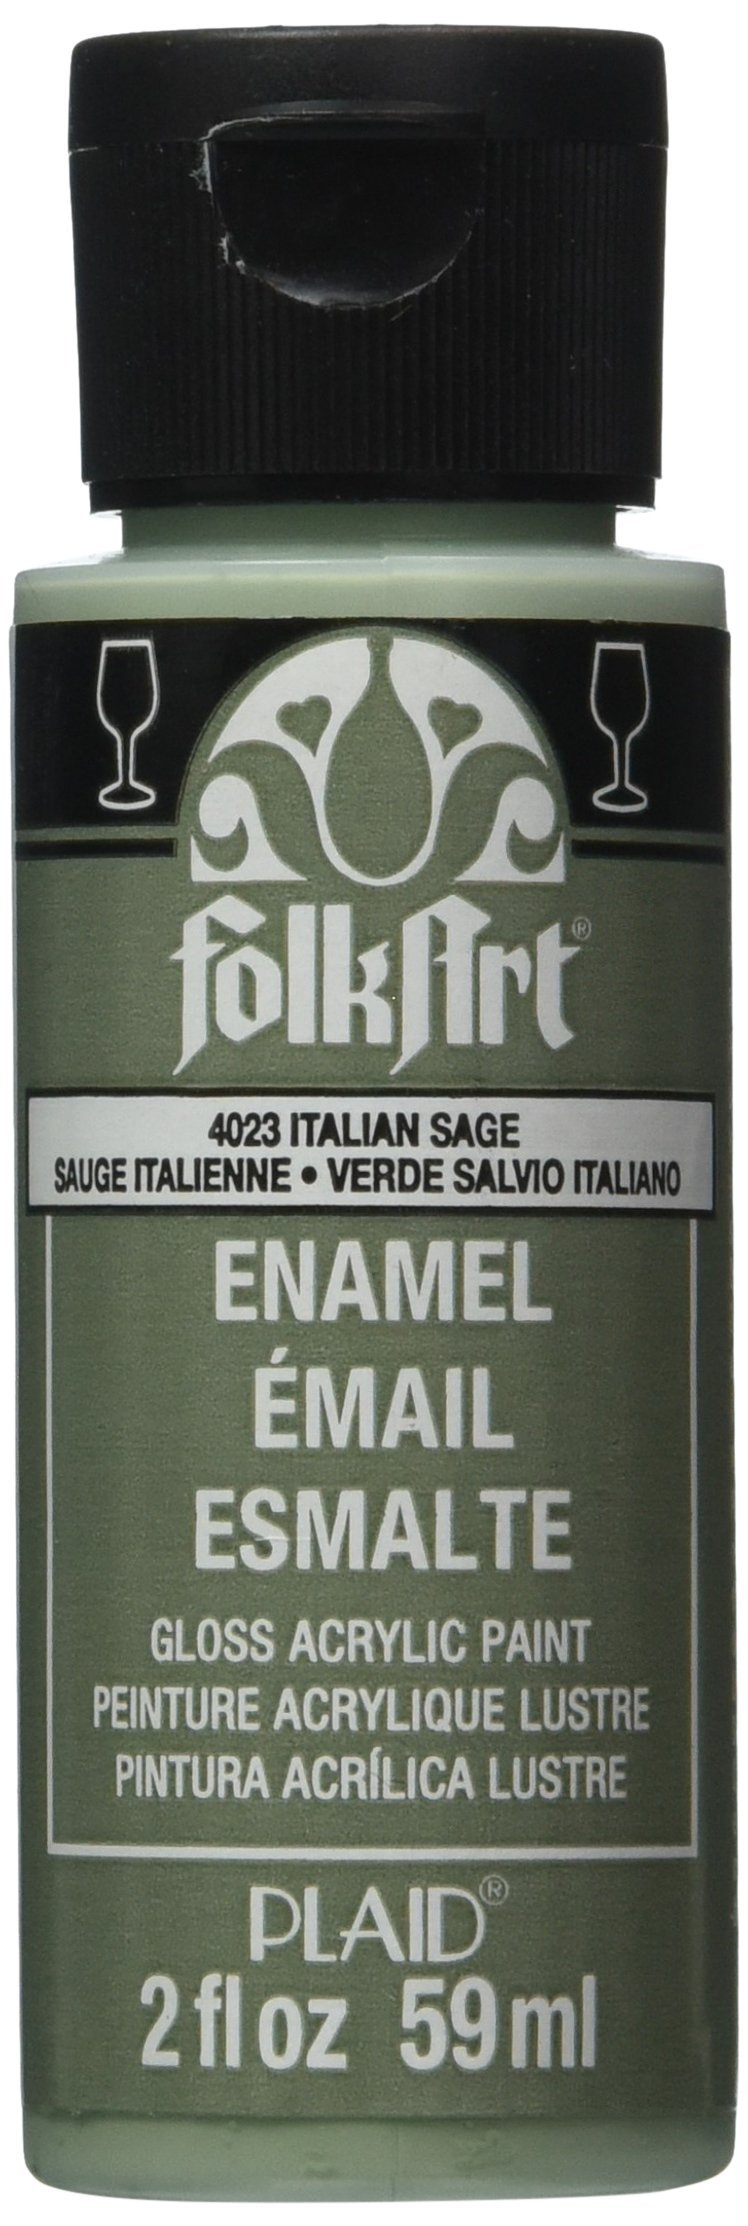 FolkArt Enamel Glass & Ceramic Paint in Assorted Colors (2 oz), 4023, Italian Sage